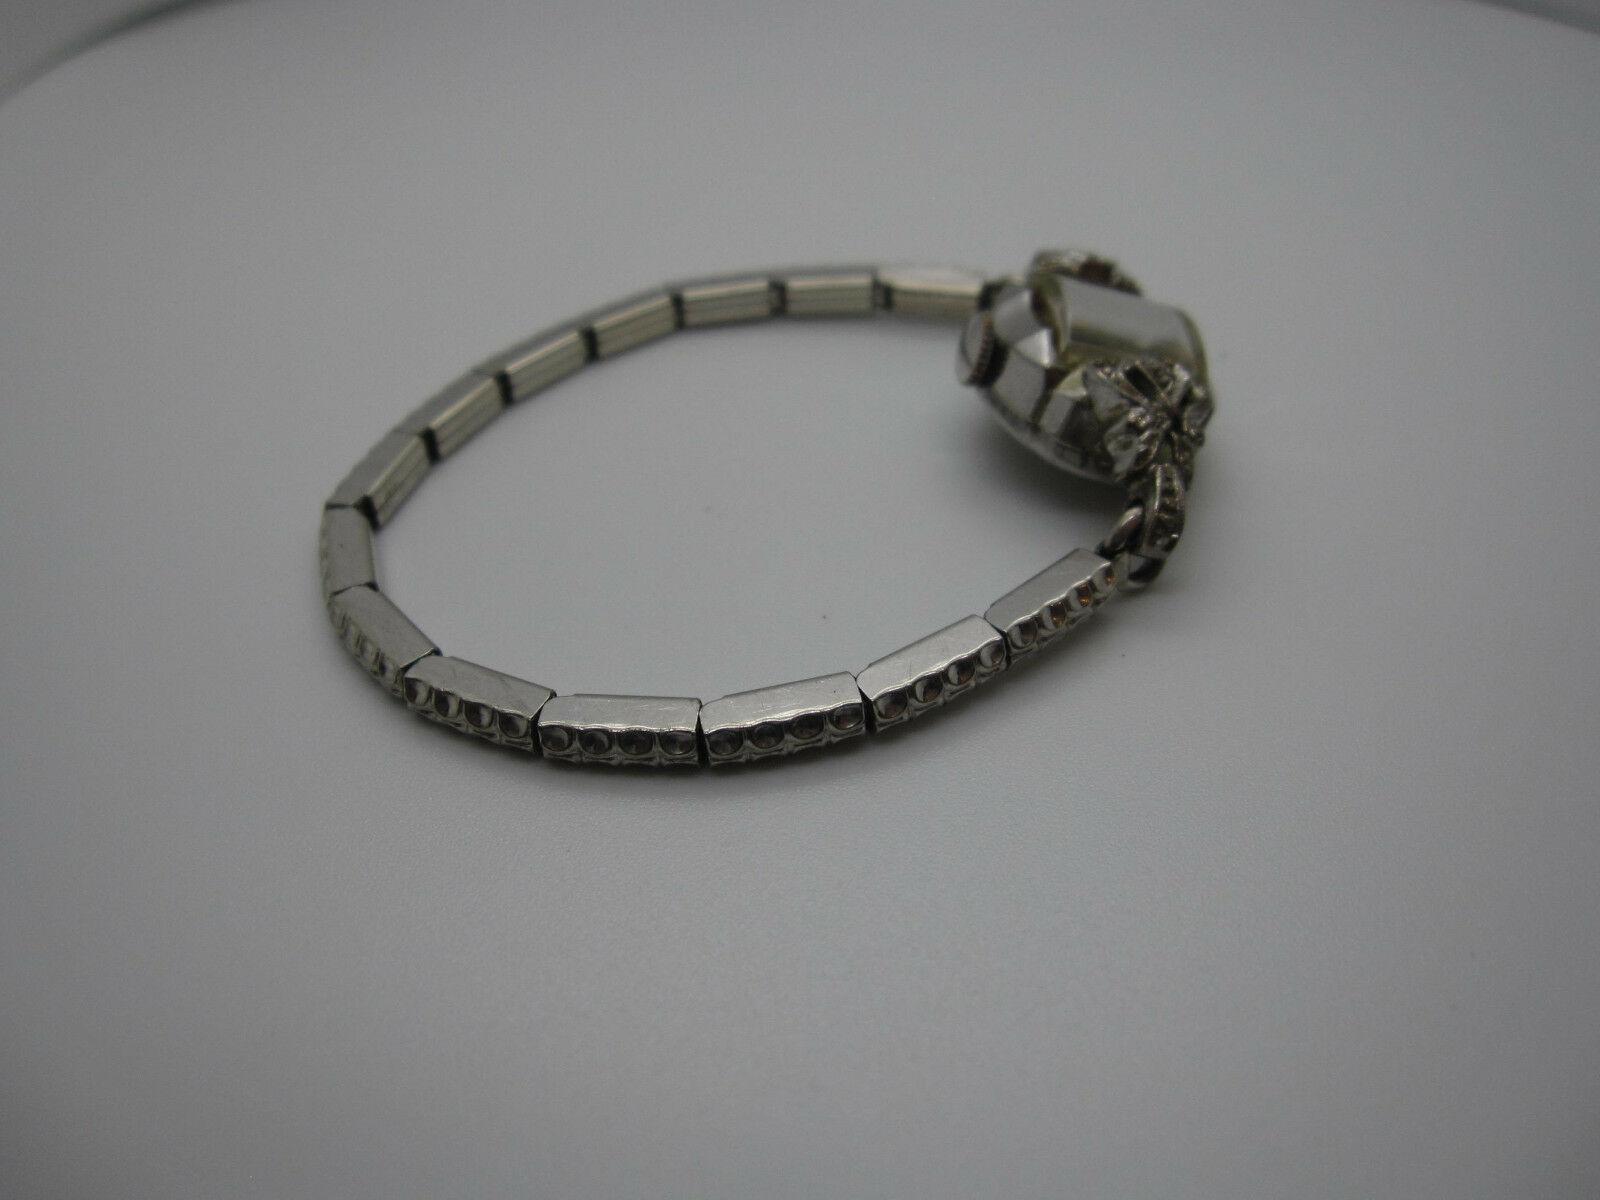 Vintage Women's Hallmark 25 Jewels 10k Rolled Gold Plated Hand Wind Watch image 8